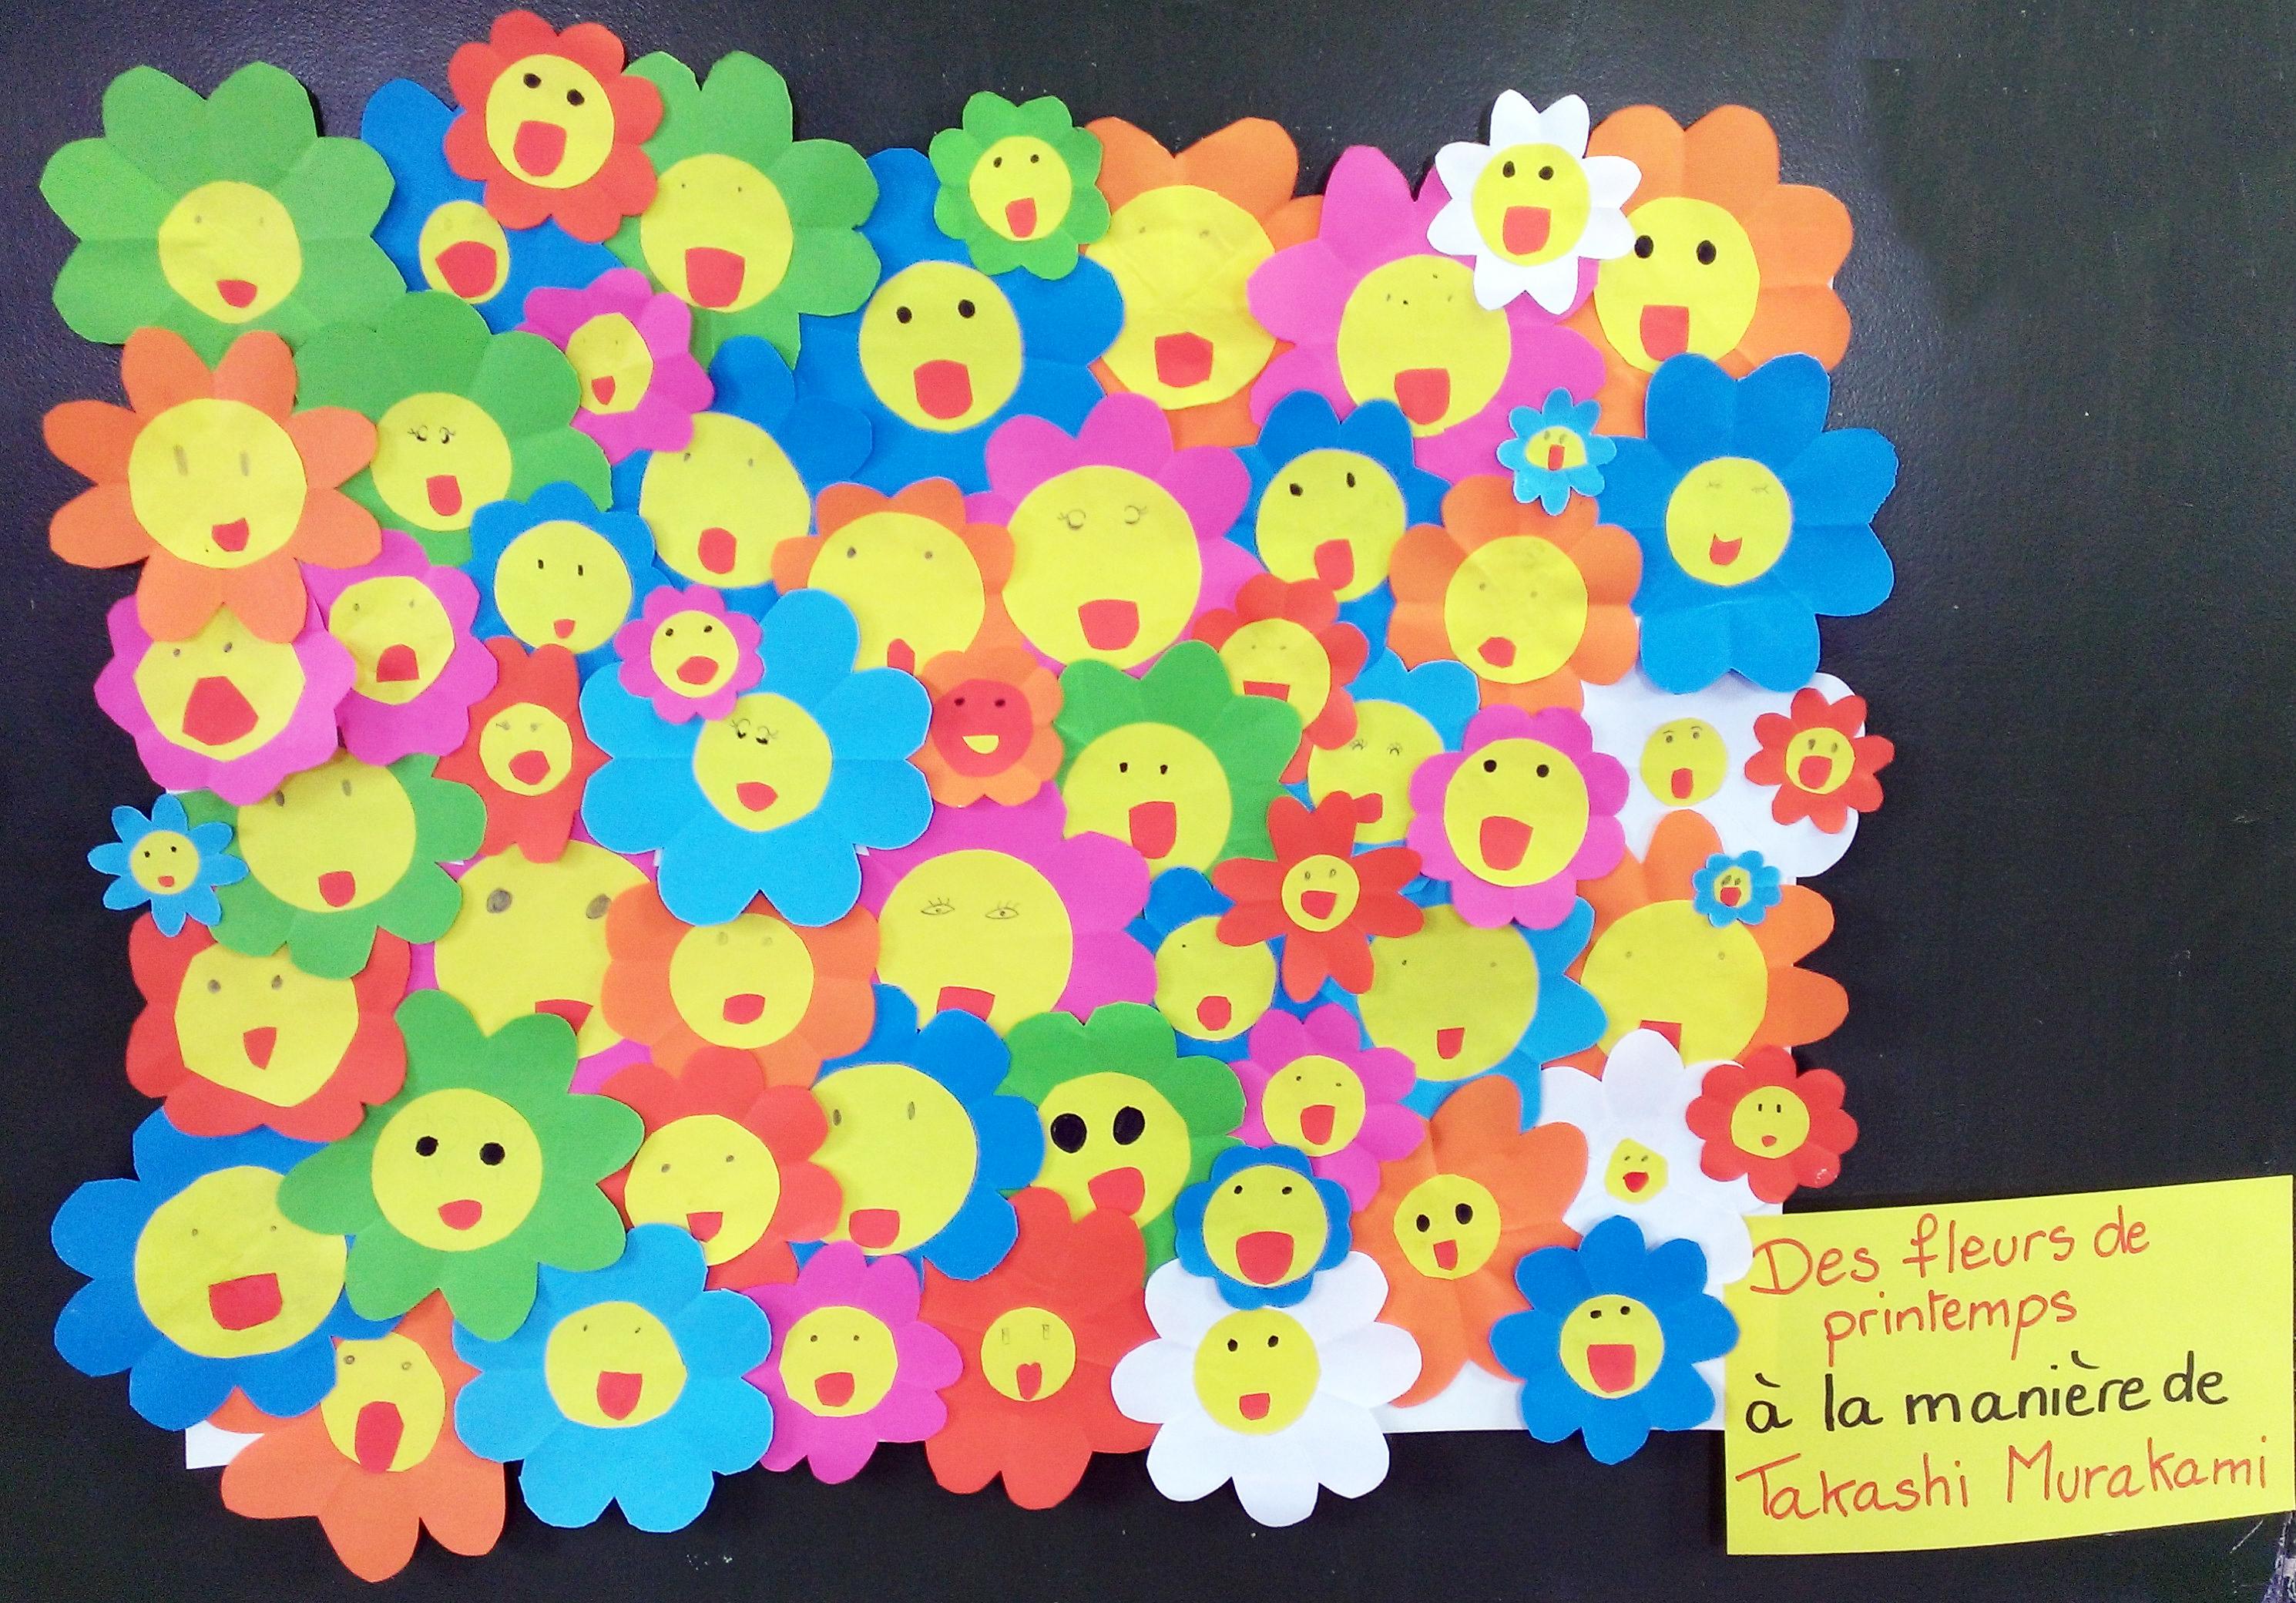 Des Fleurs De Printemps La Manire De Takashi Murakami